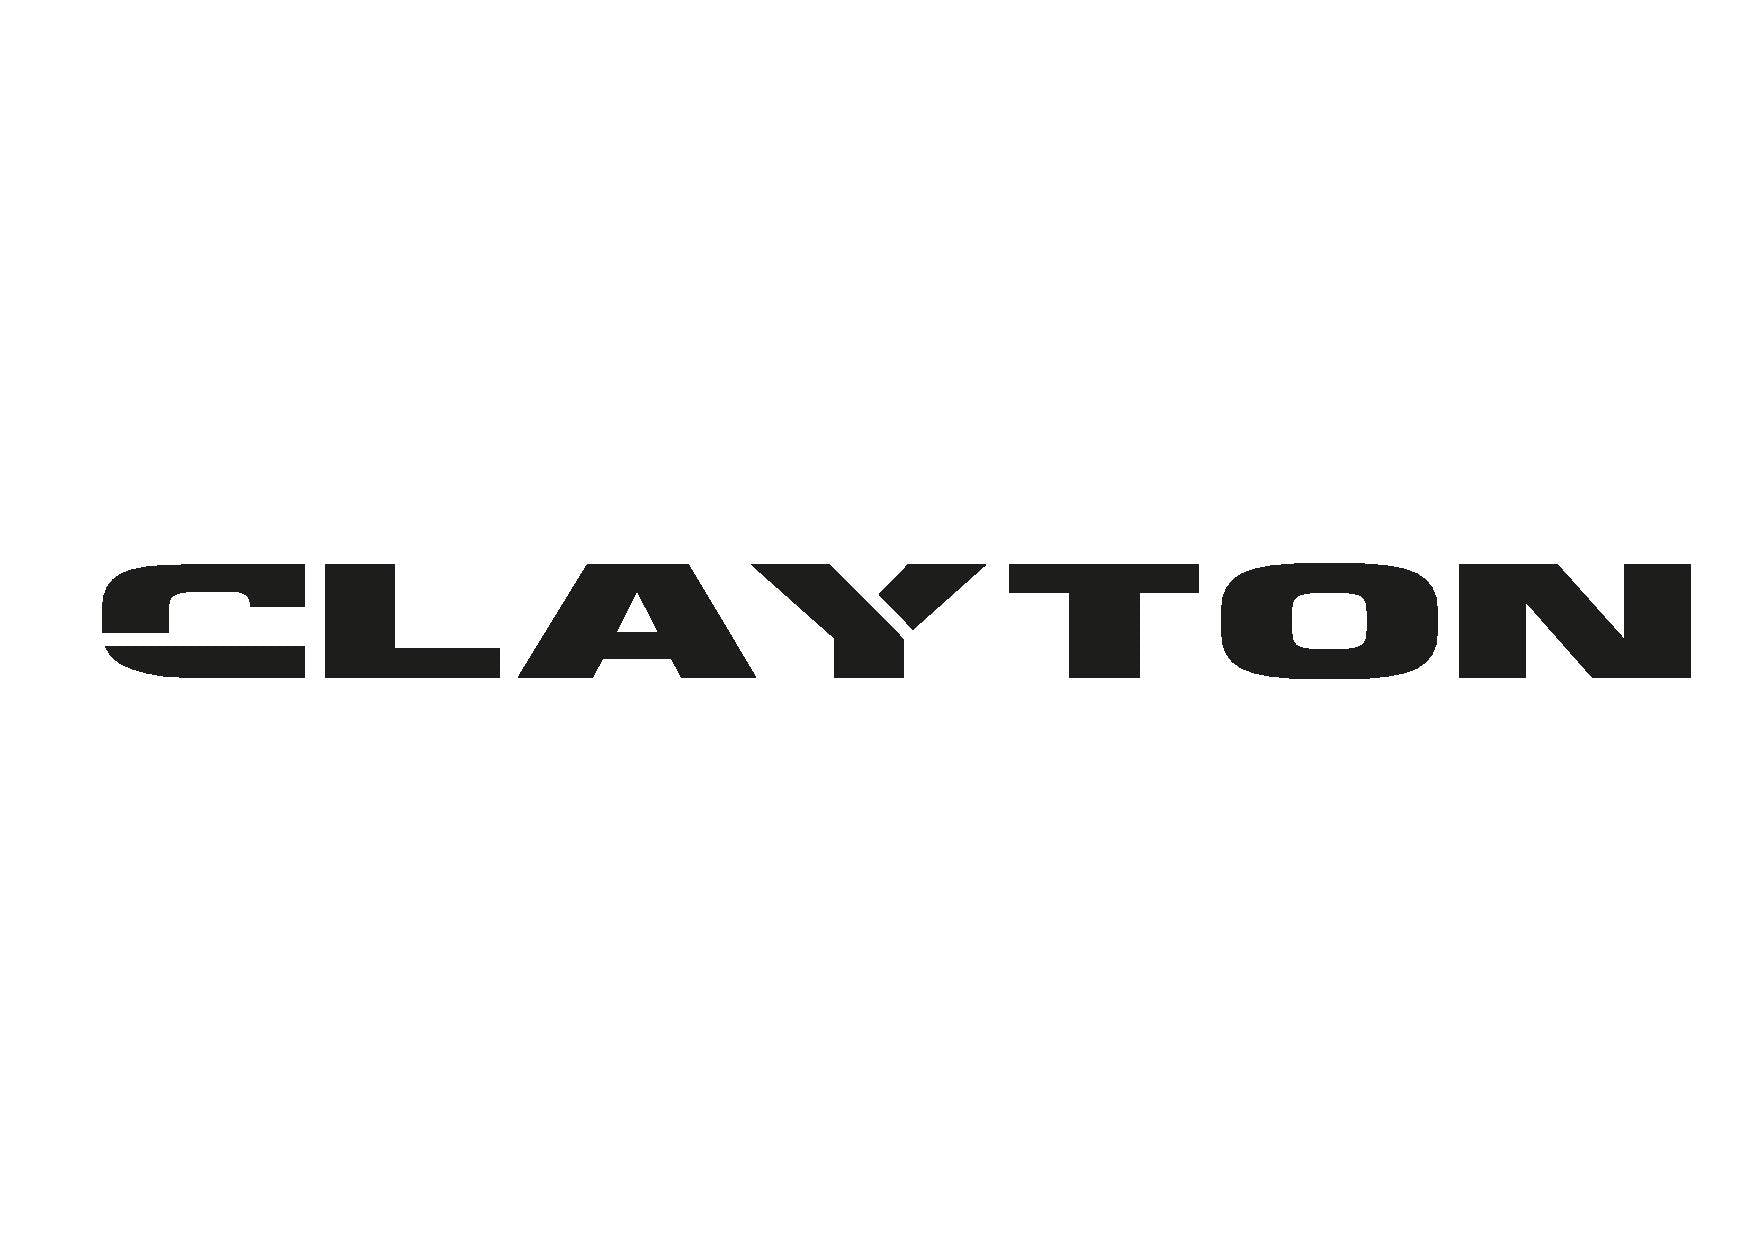 logo clayton-page-001